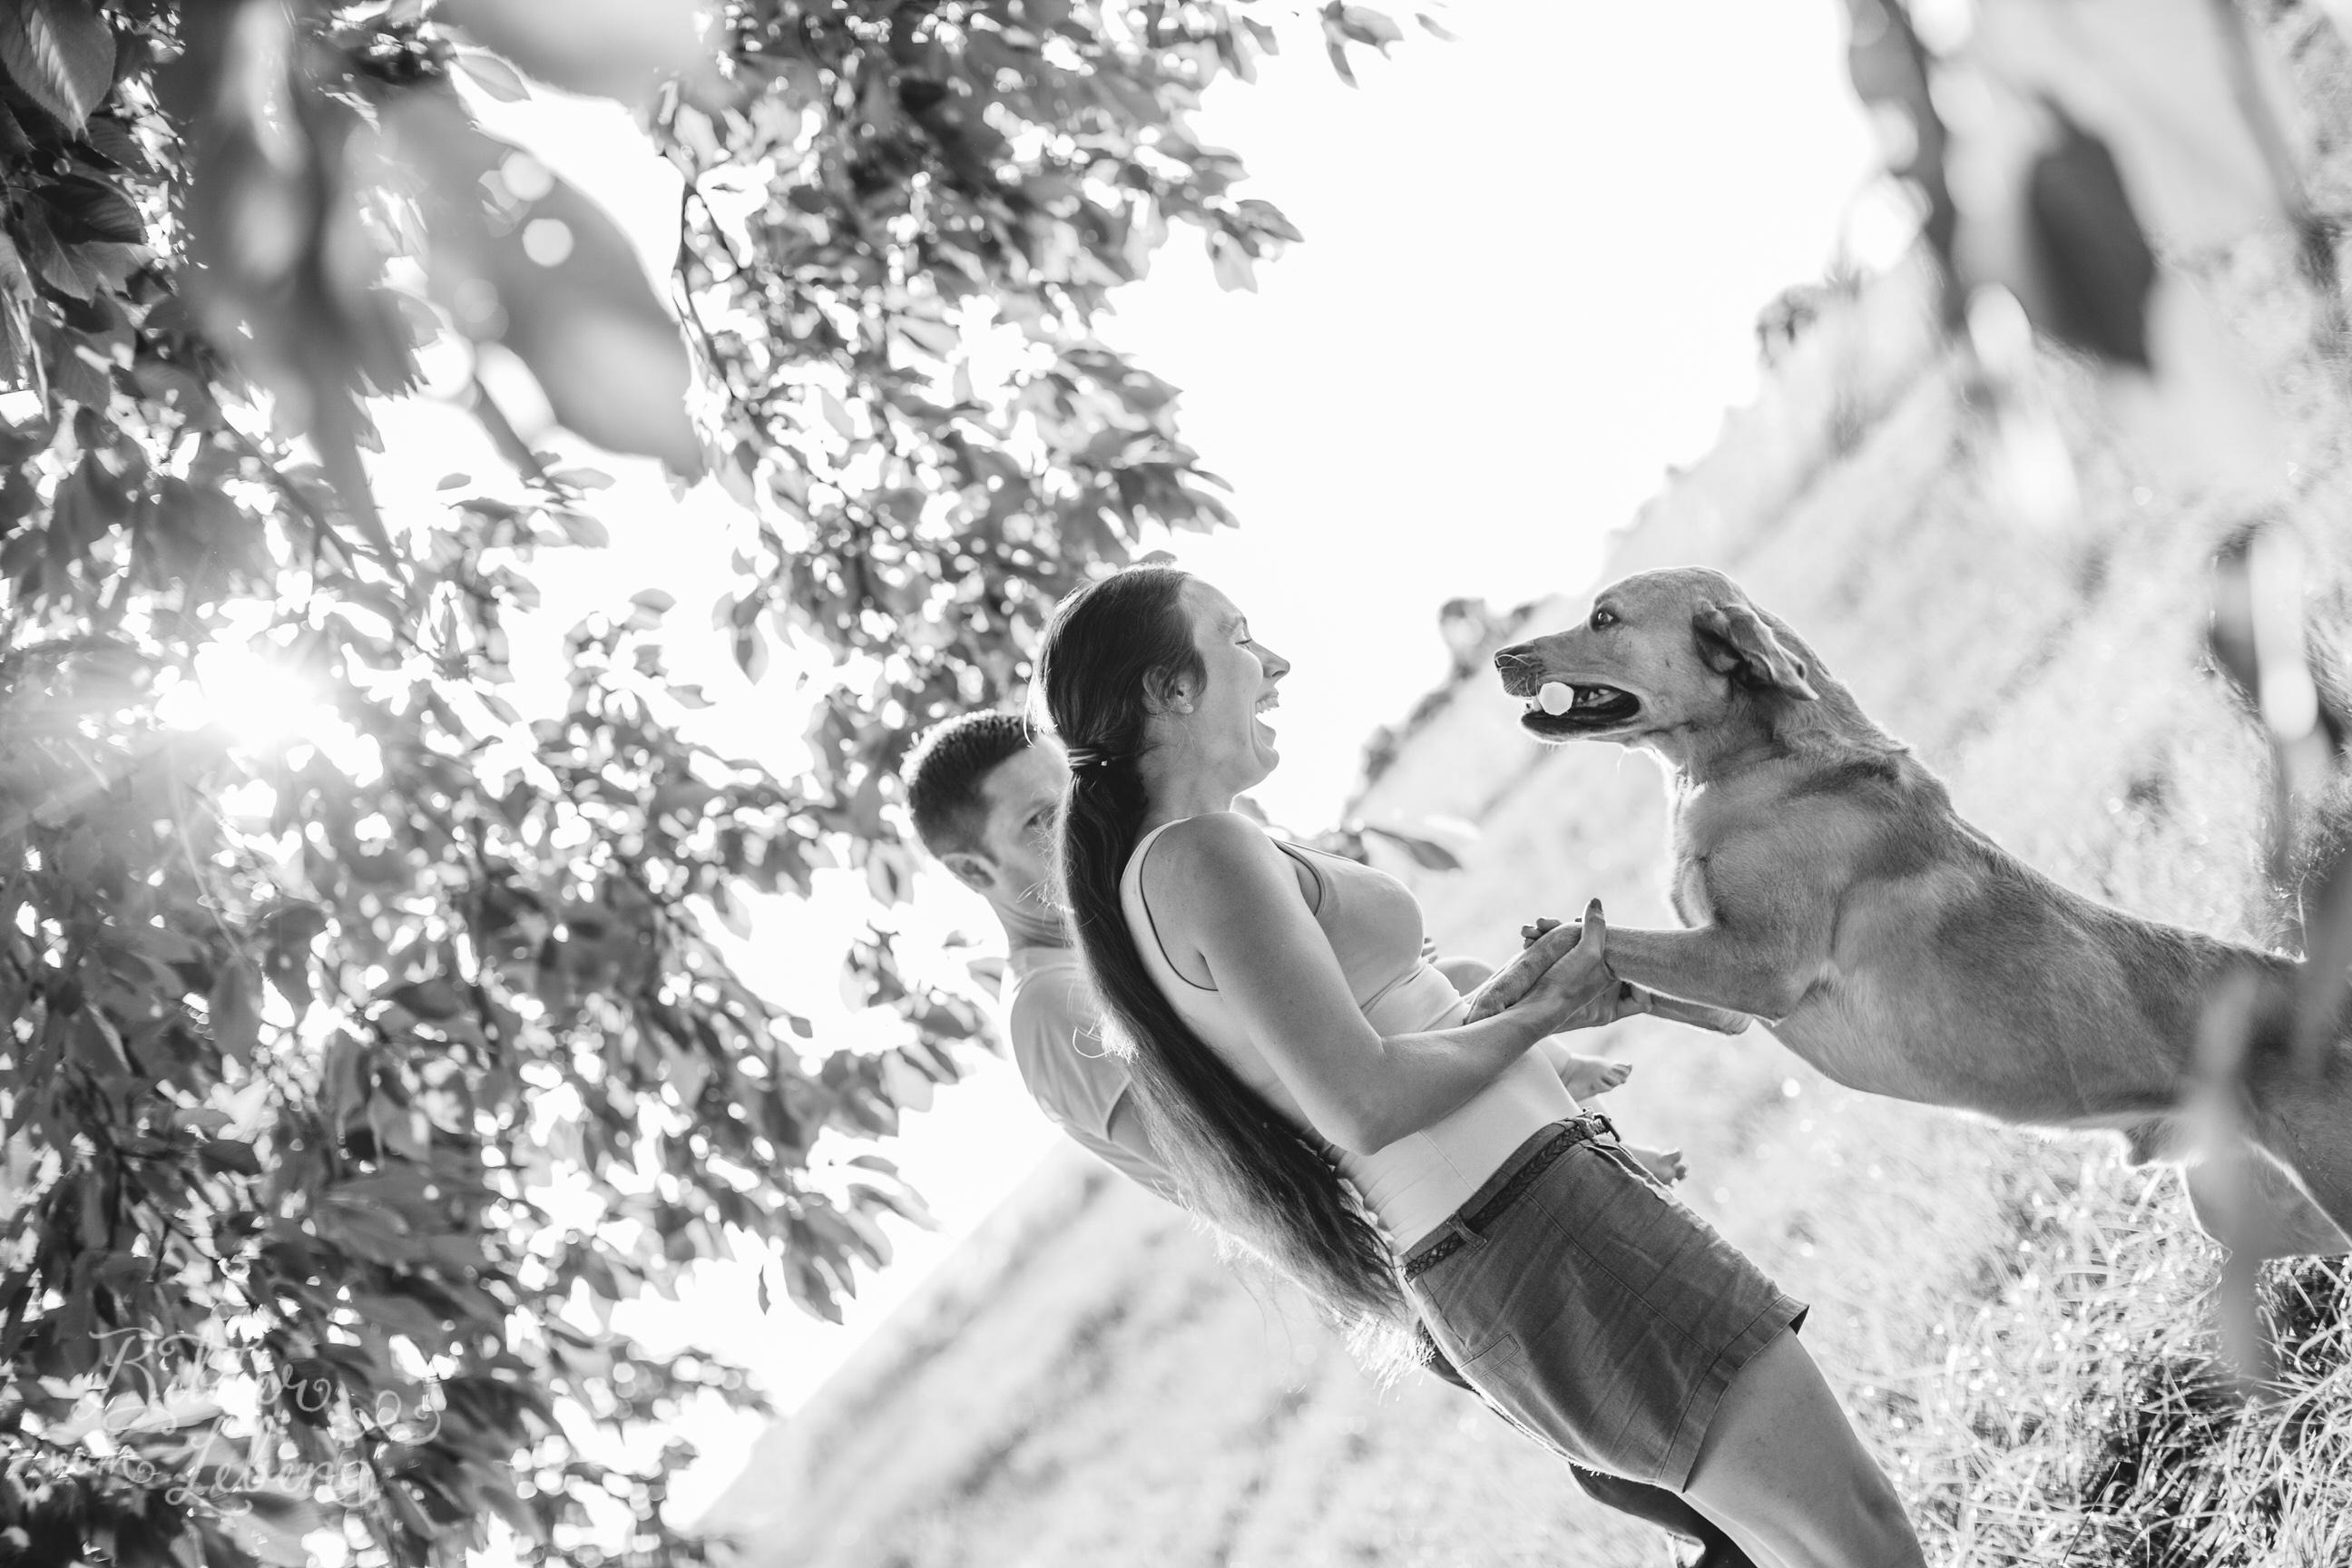 Greta-Labrador-Kinder-Portraits-BildervomLeben-2016-8378